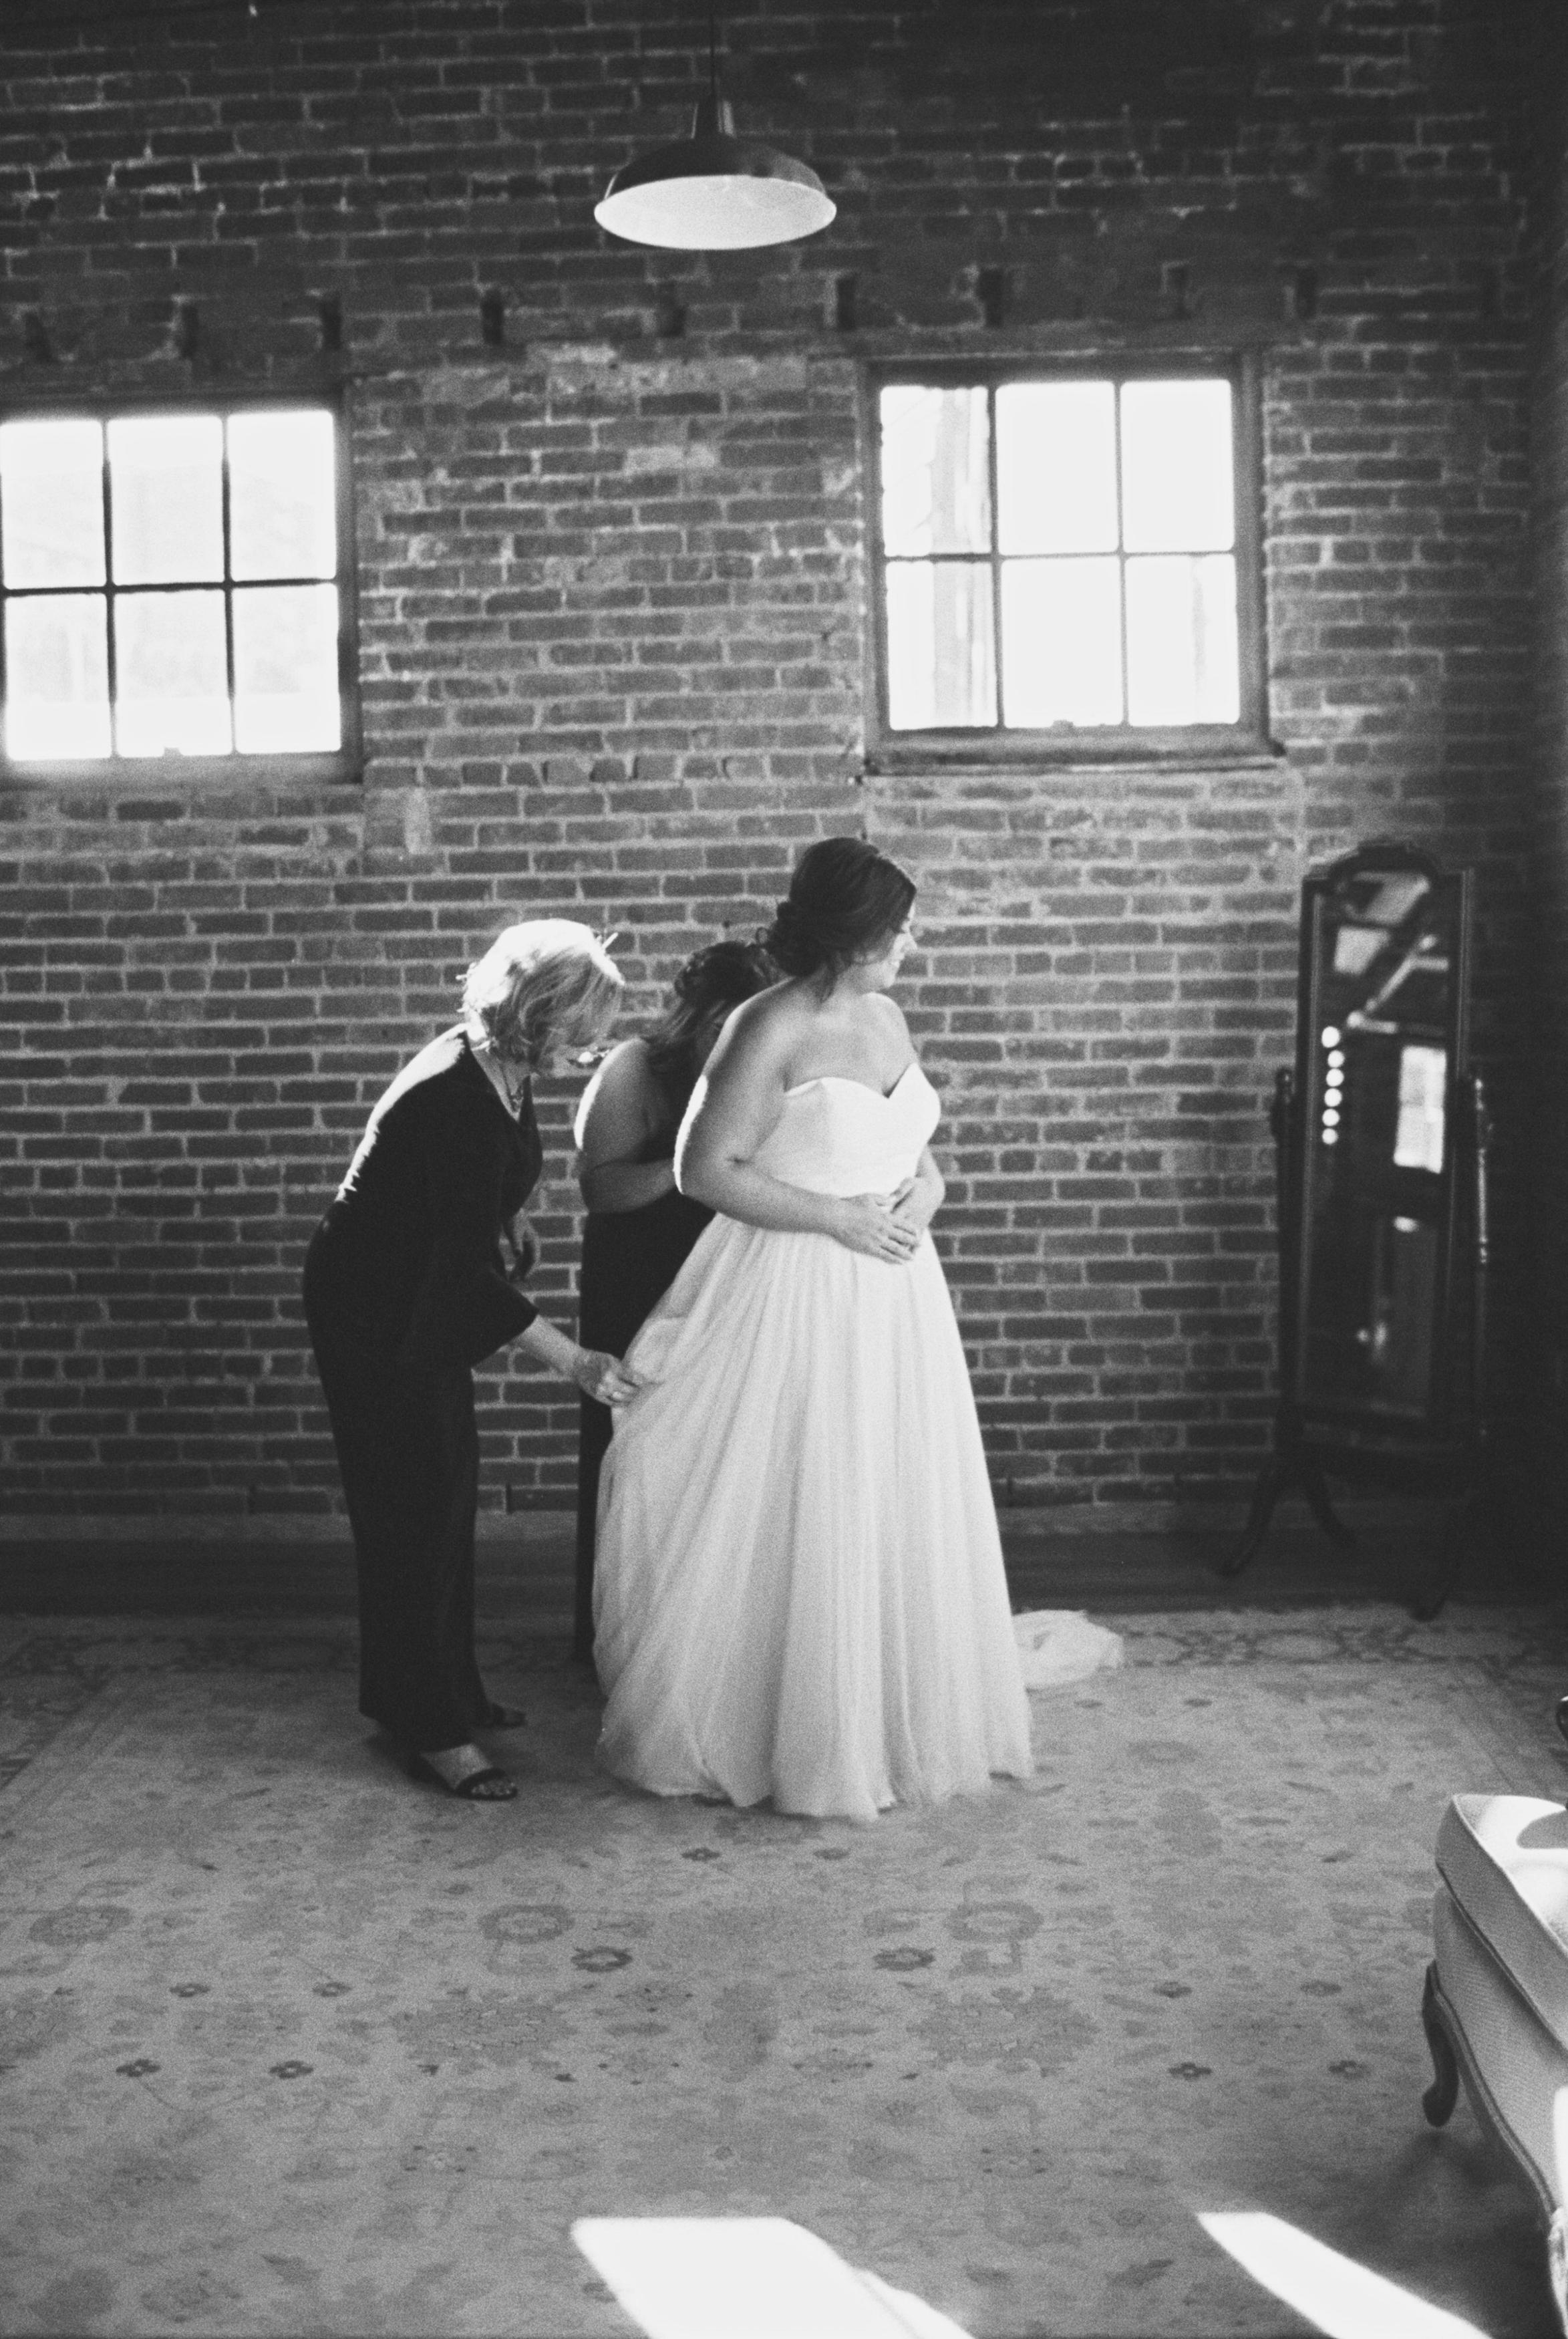 Lauren_Jeremy_Standard_Wedding_Knoxville_Abigail_Malone_Photography_FIlm-77.jpg